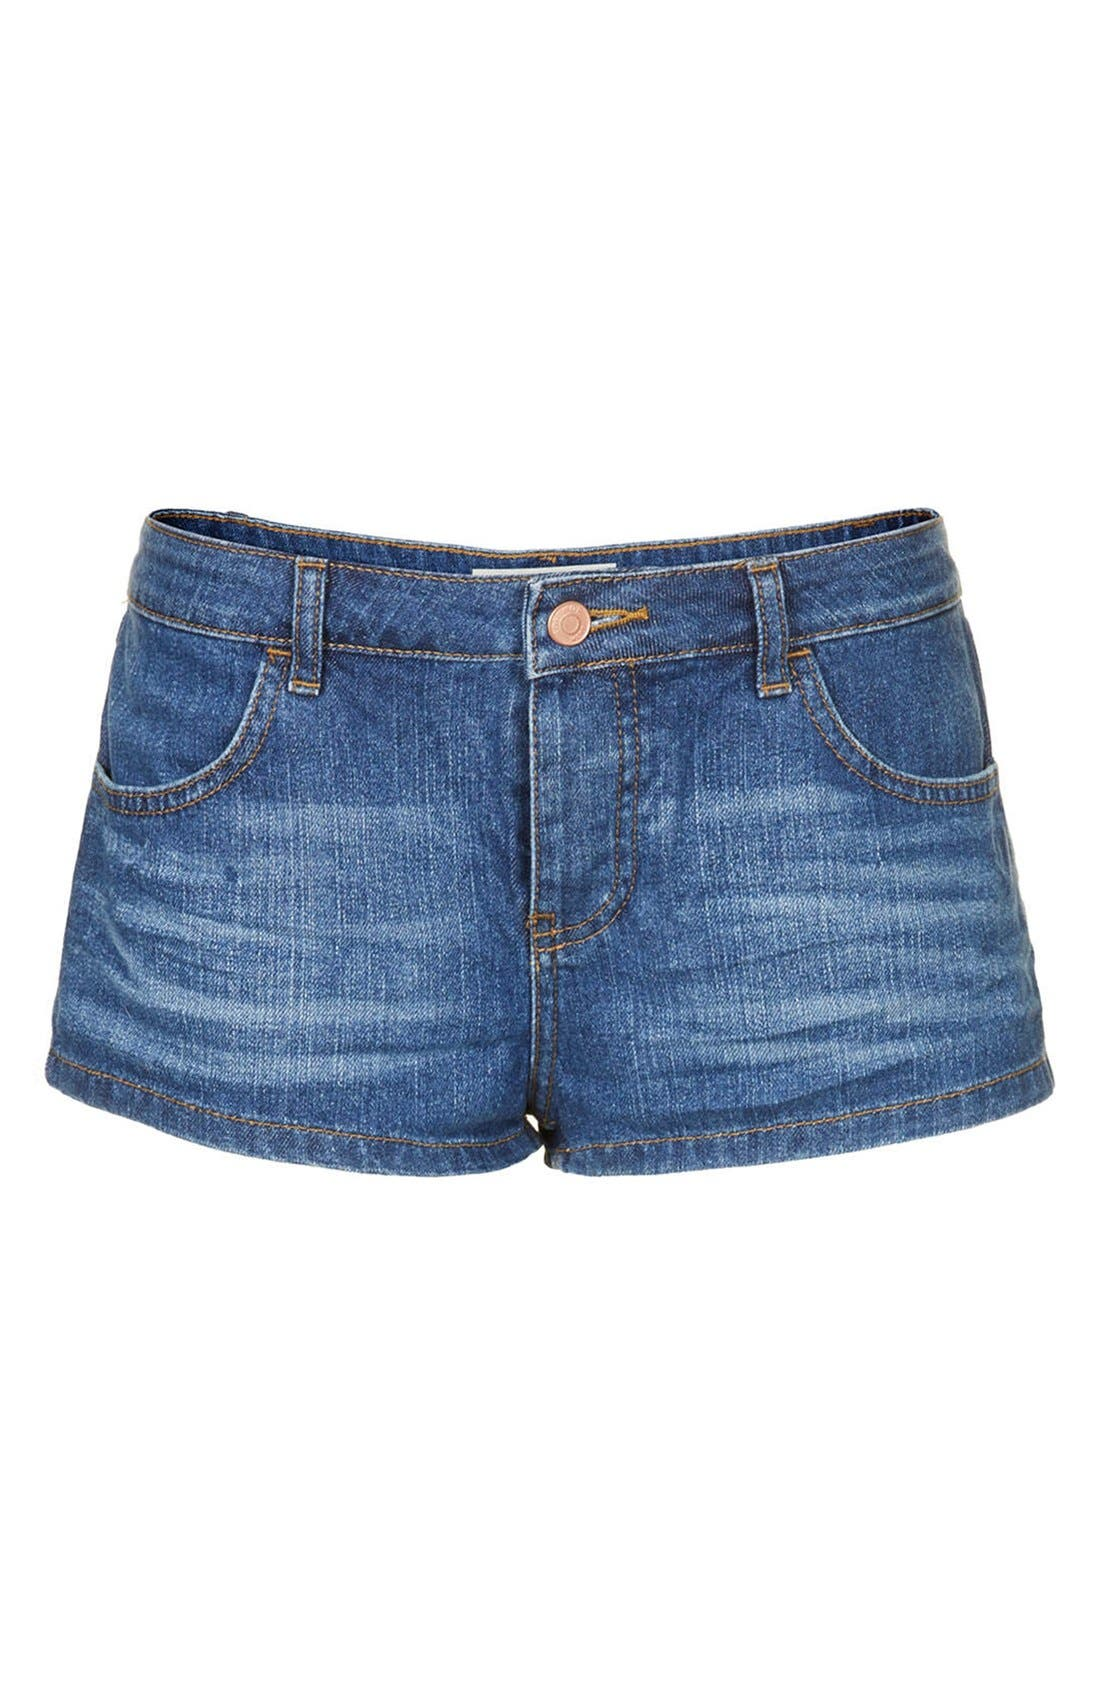 Alternate Image 3  - Topshop Moto 'Daisy' Denim Shorts